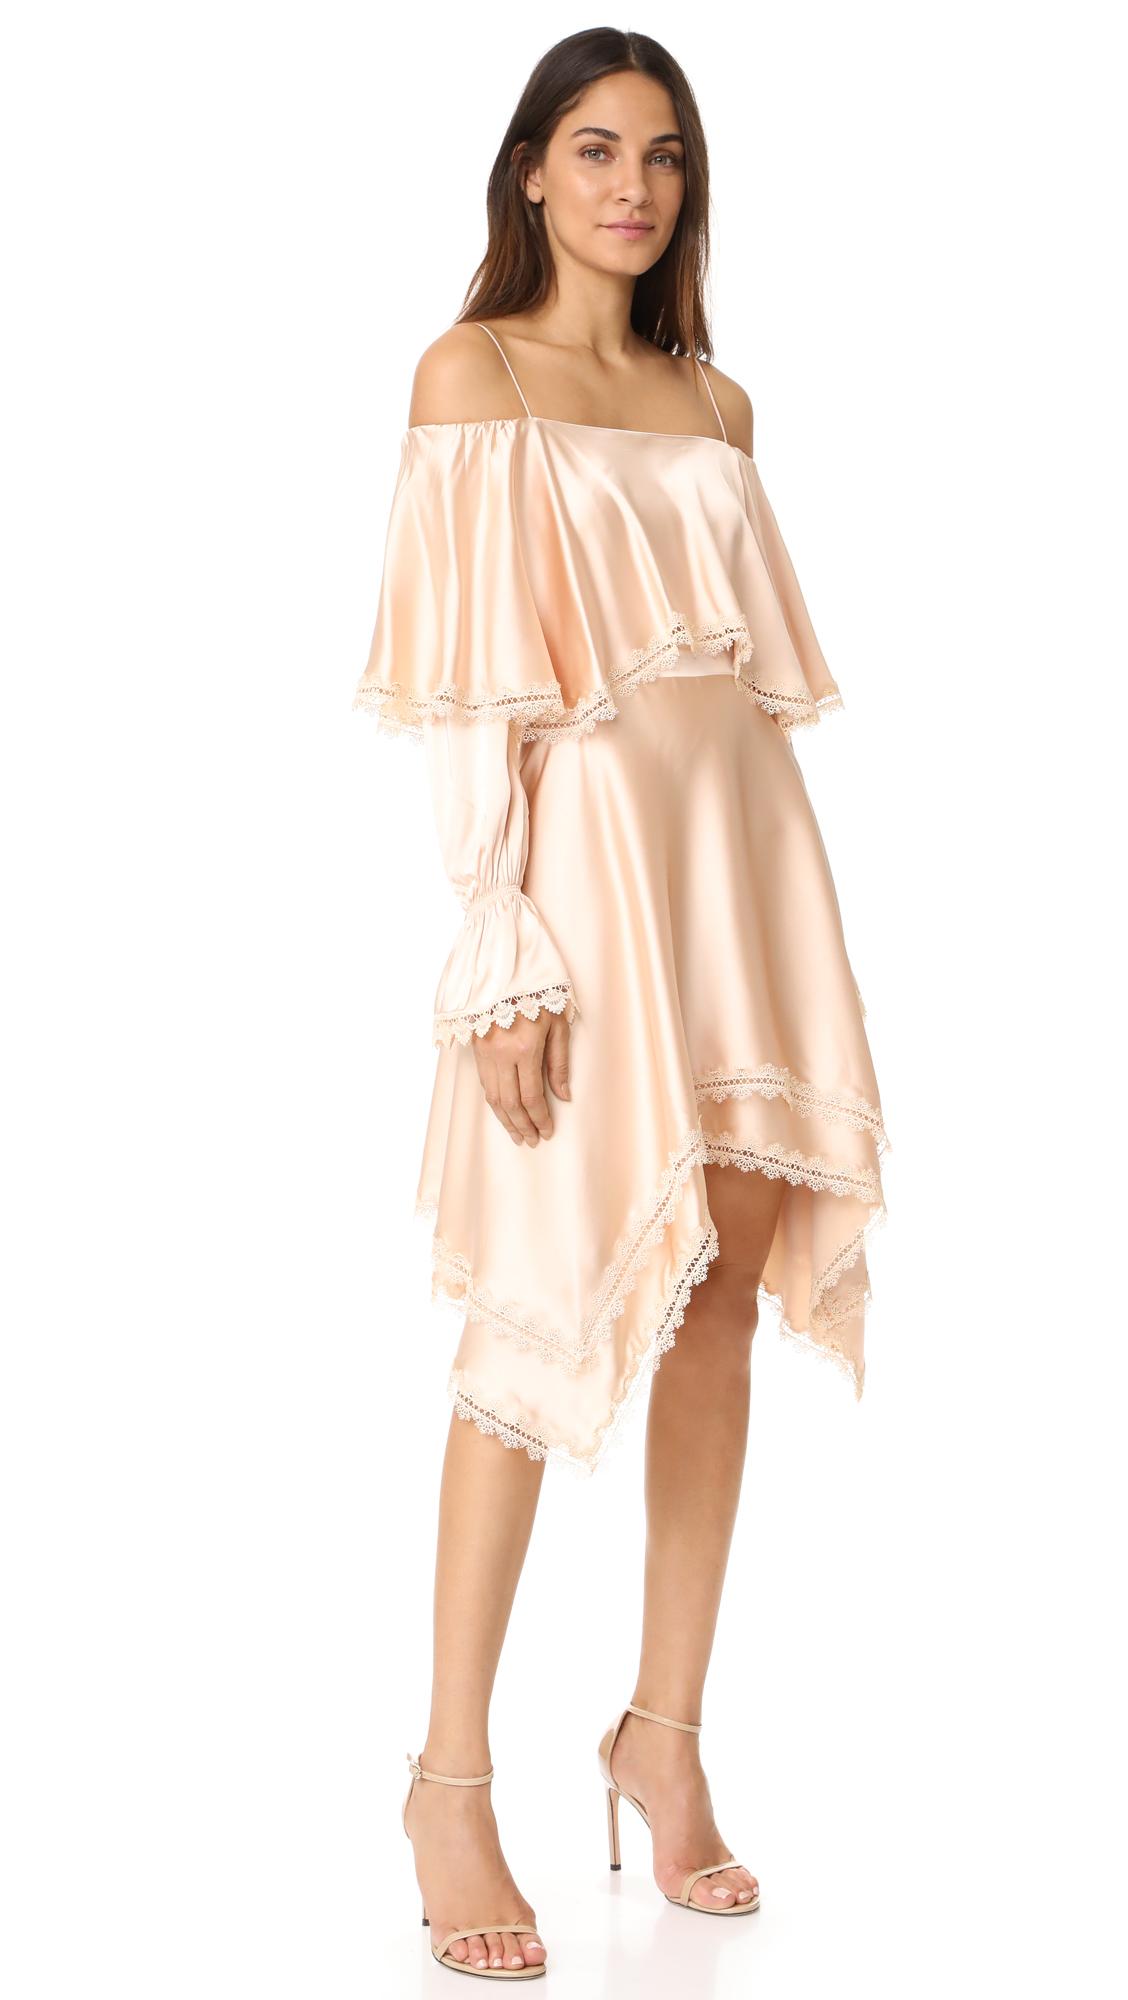 Jonathan Simkhai Off Shoulder Ruffle Dress - Nude